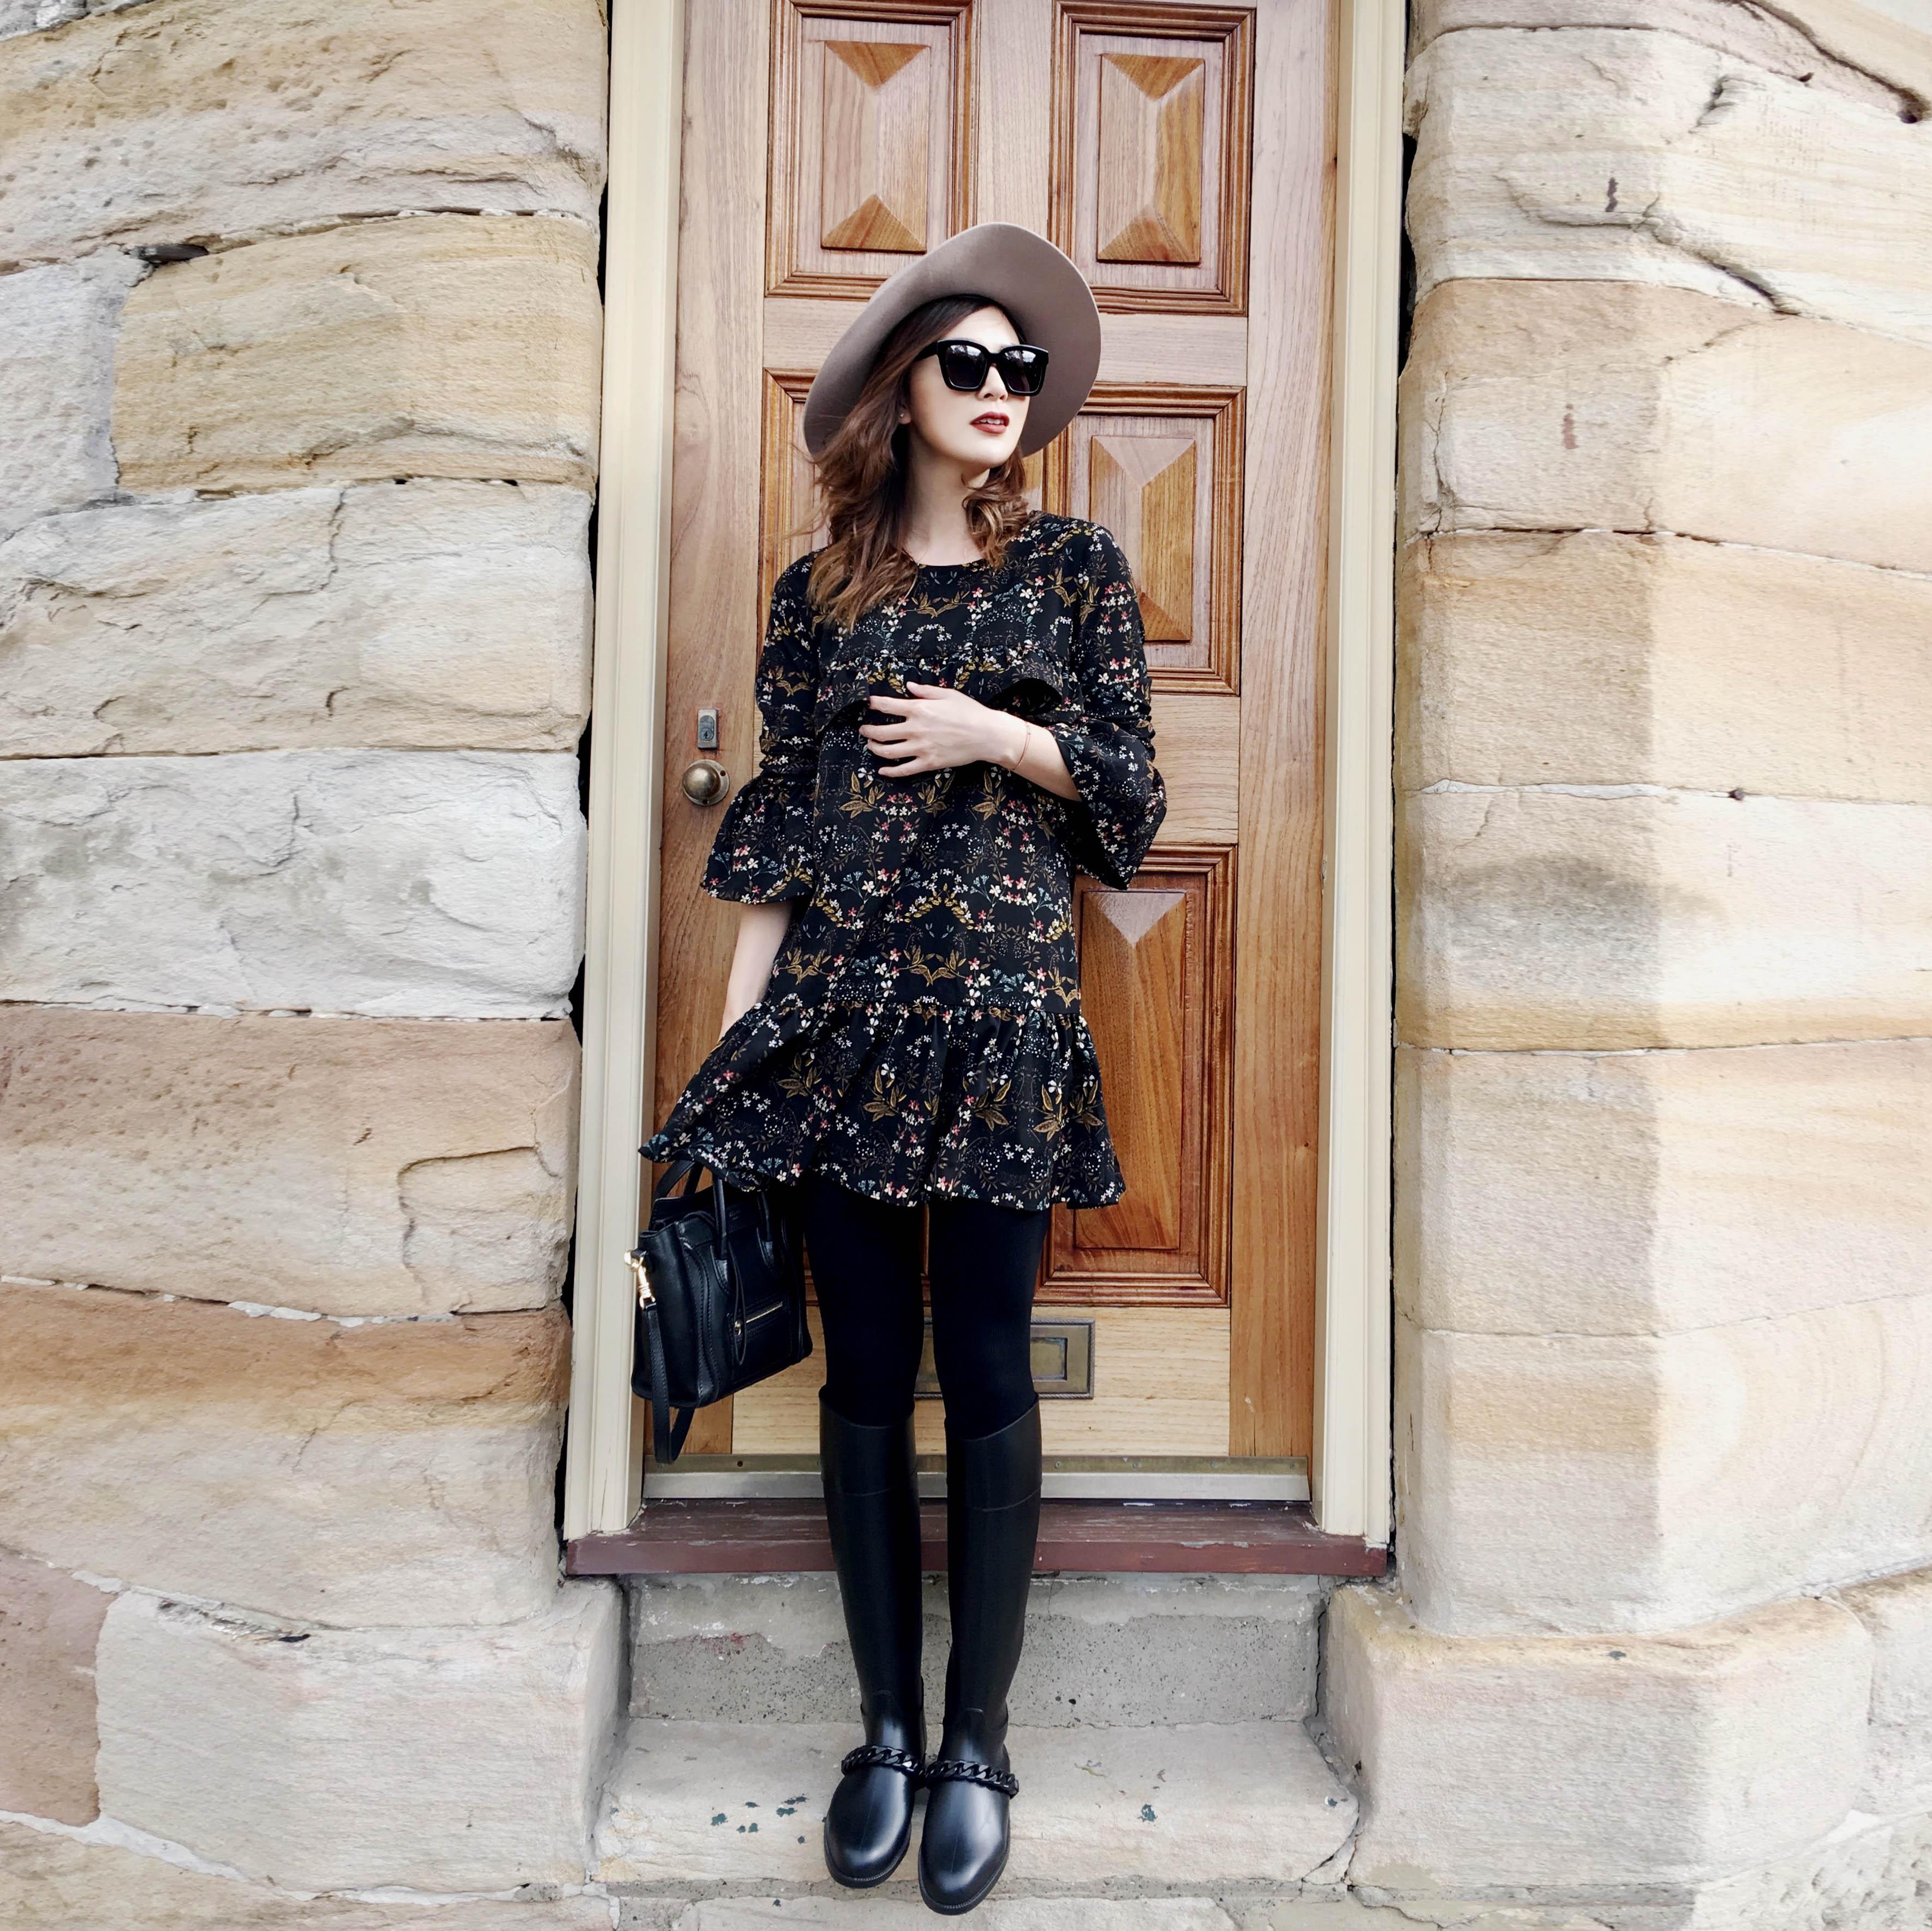 DEARCOCOLI 独家制作 荷叶袖直筒黑底碎花荷叶裙边宽松连衣裙